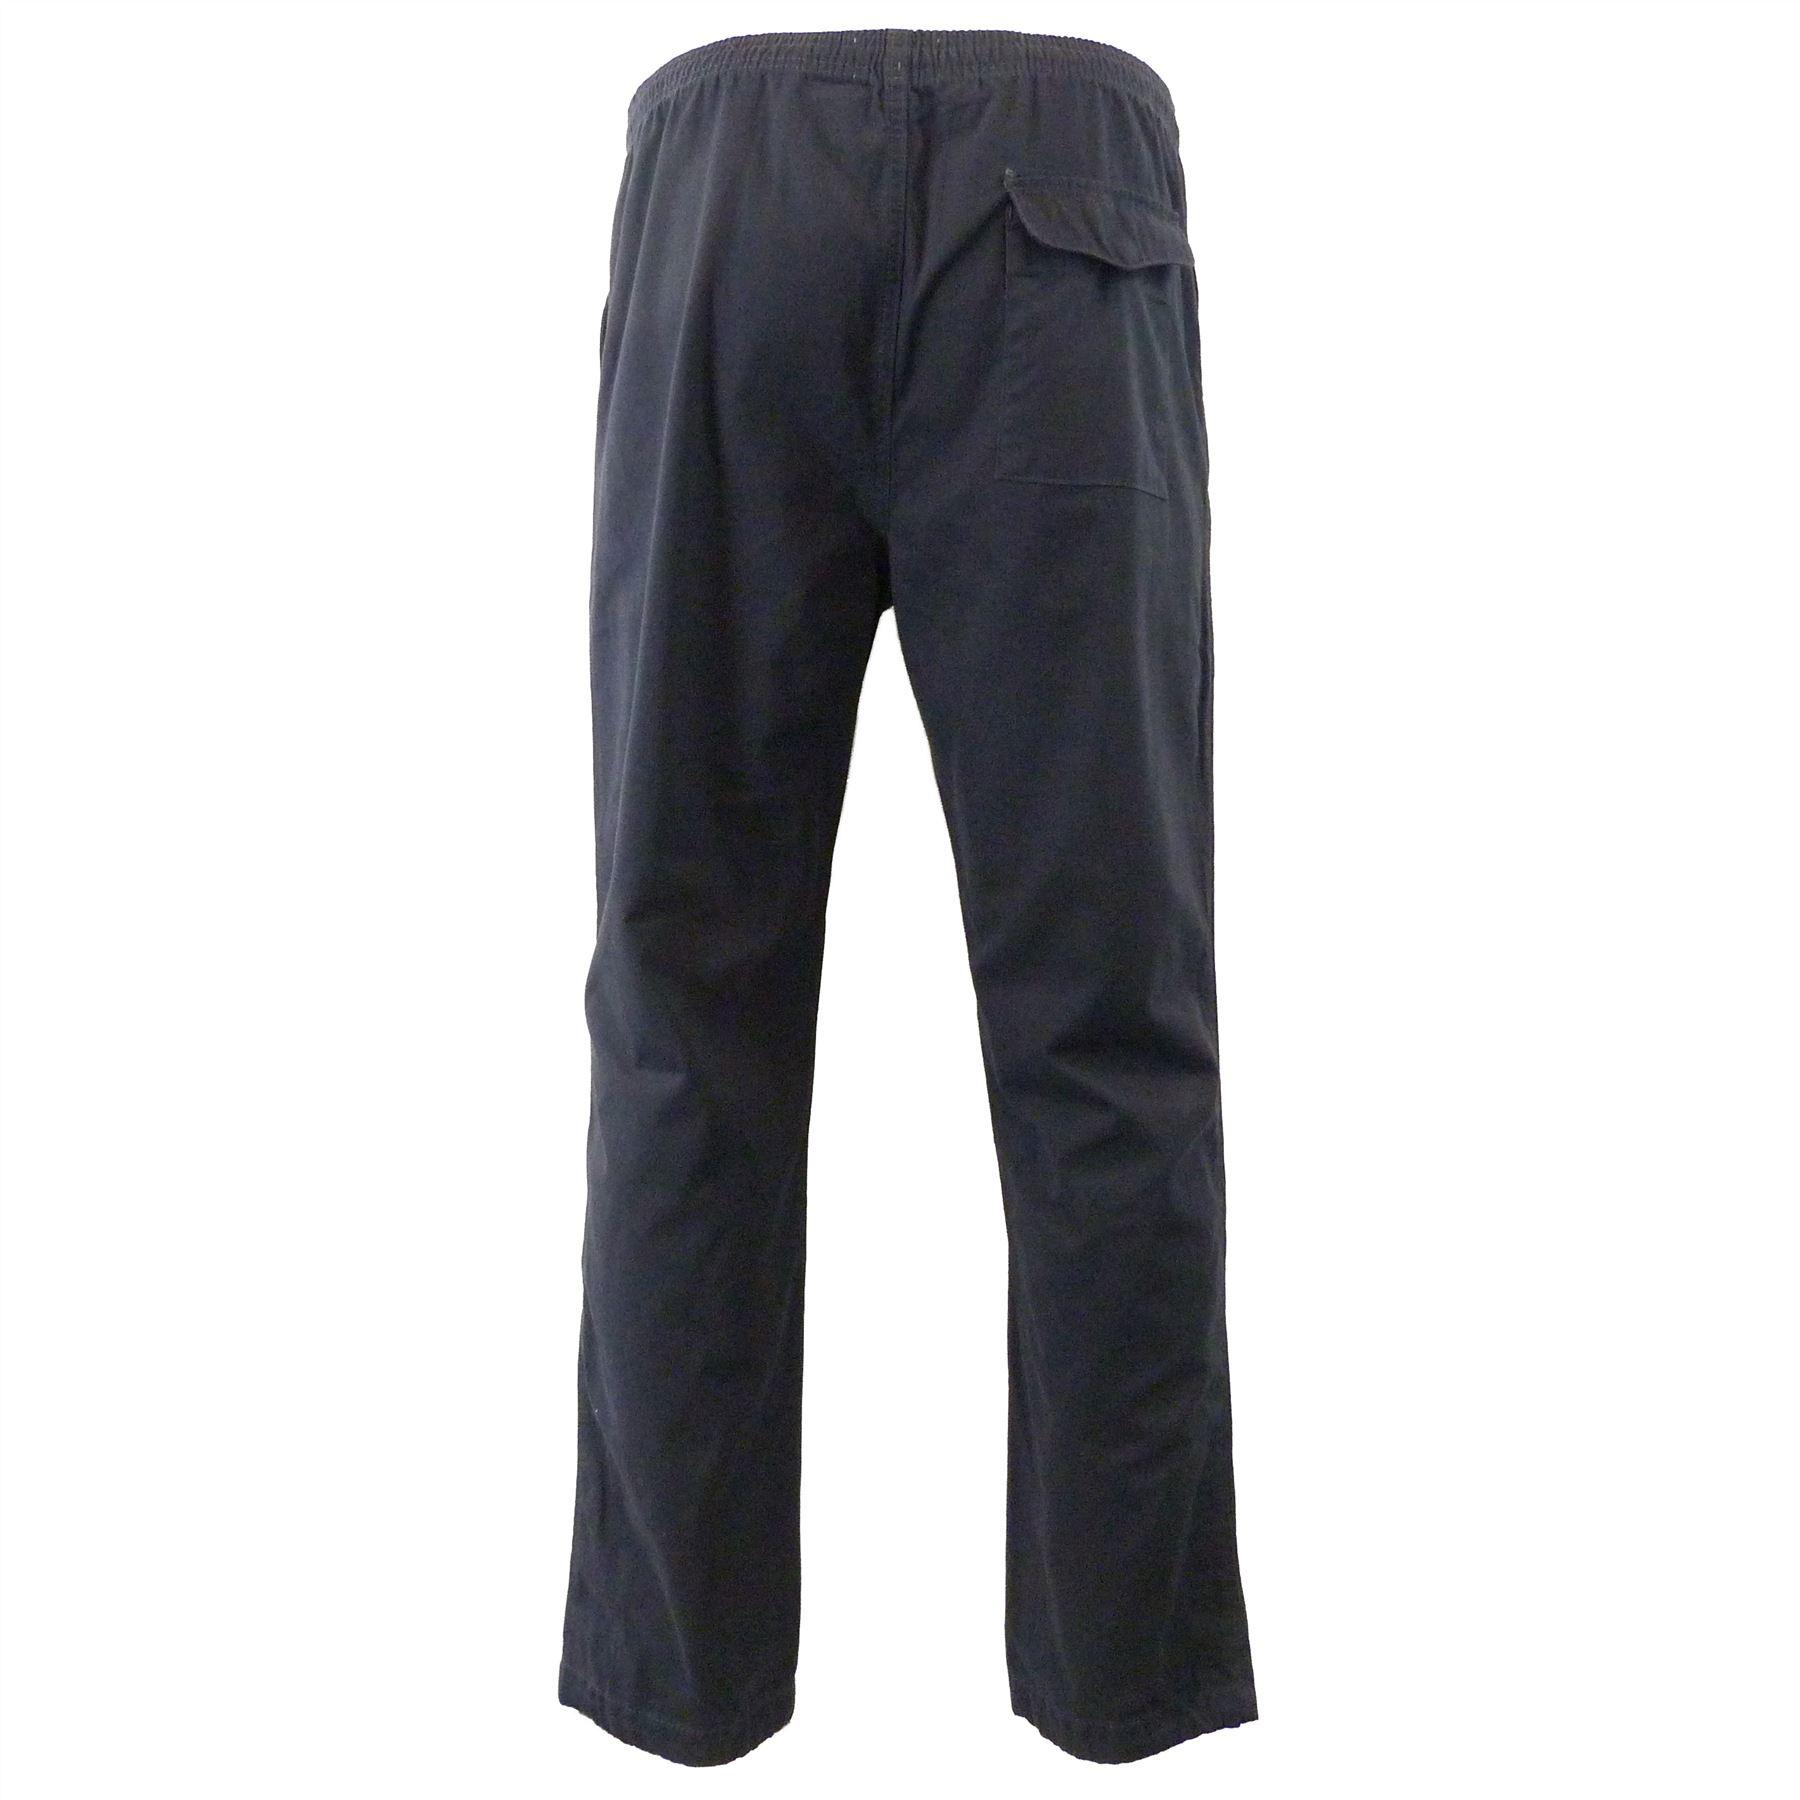 Ex-M-amp-S-Marks-and-Spencer-Coleccion-Regular-Fit-puro-algodon-Chinos-Pantalones miniatura 7